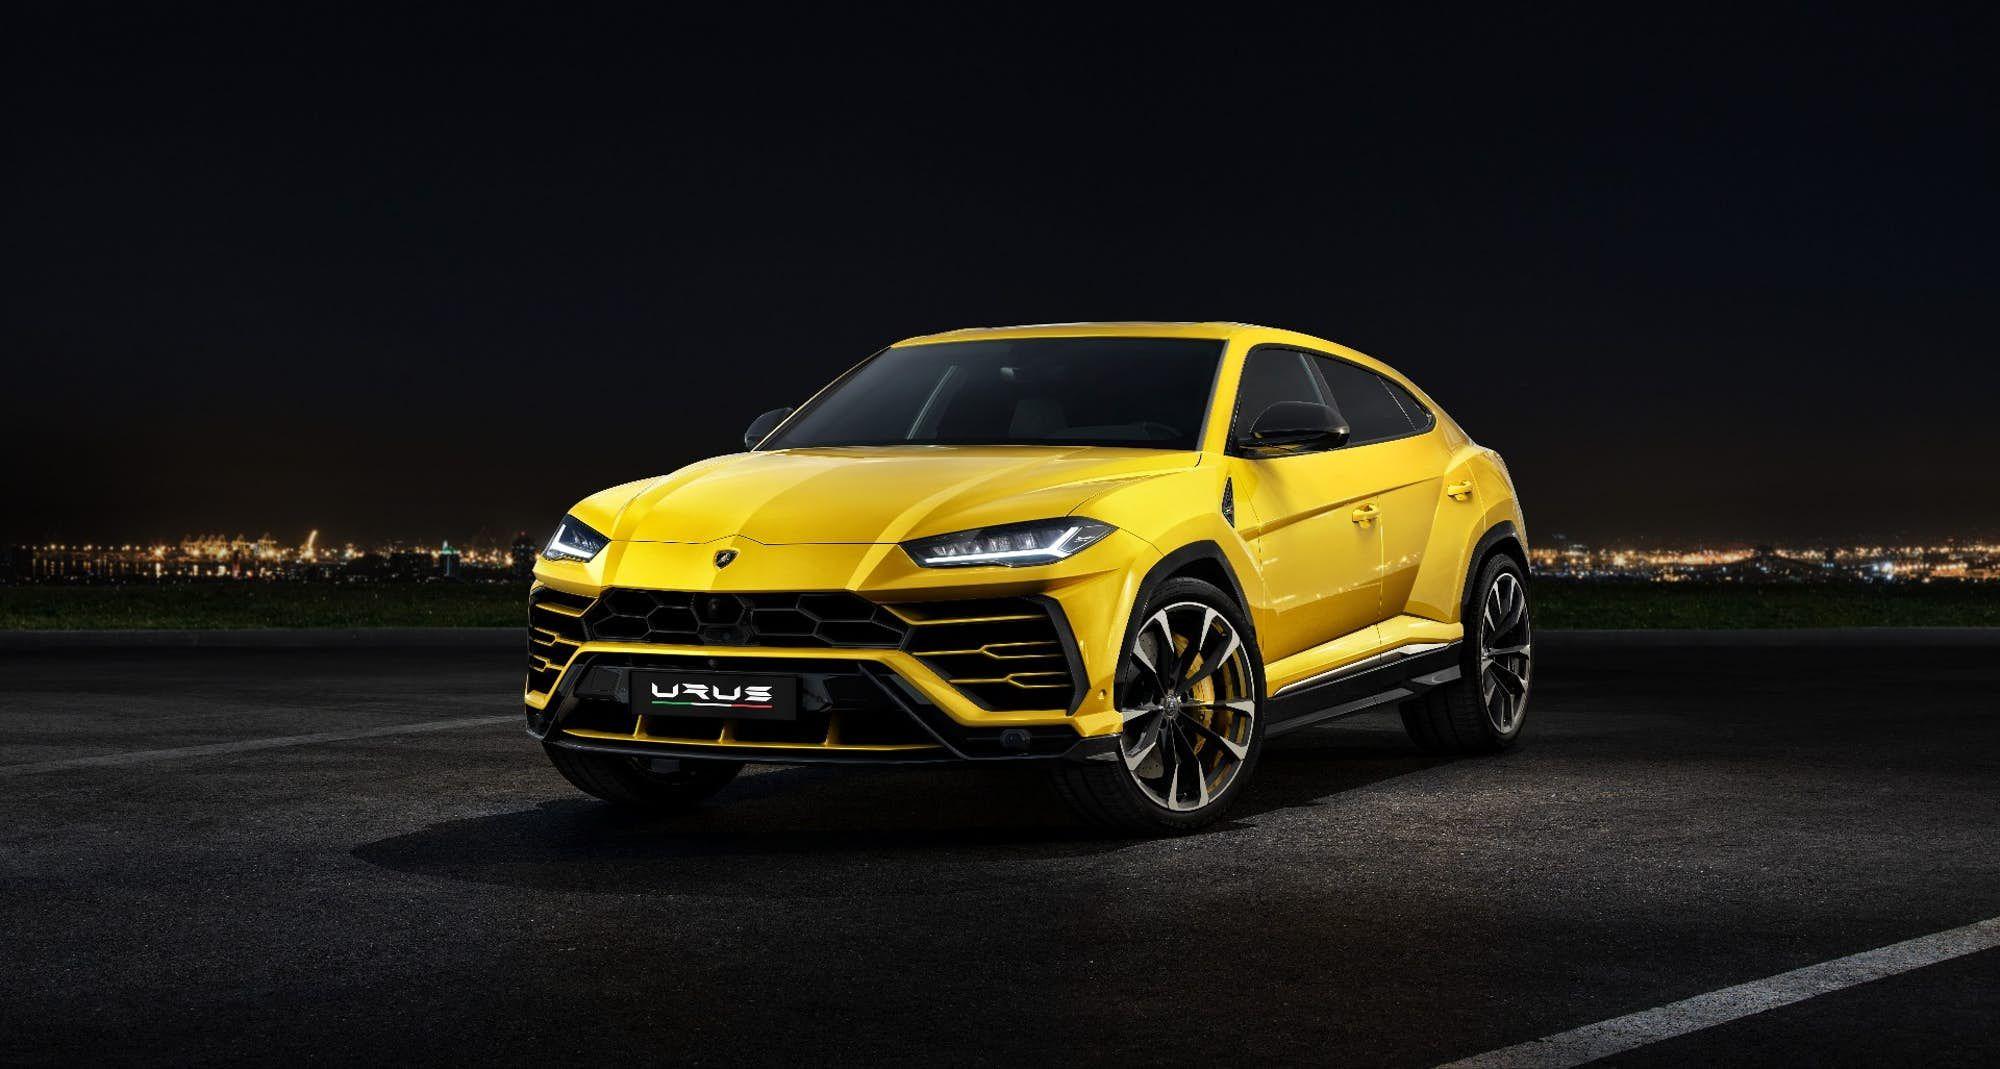 brands its Urus the first Super SUV Luxury